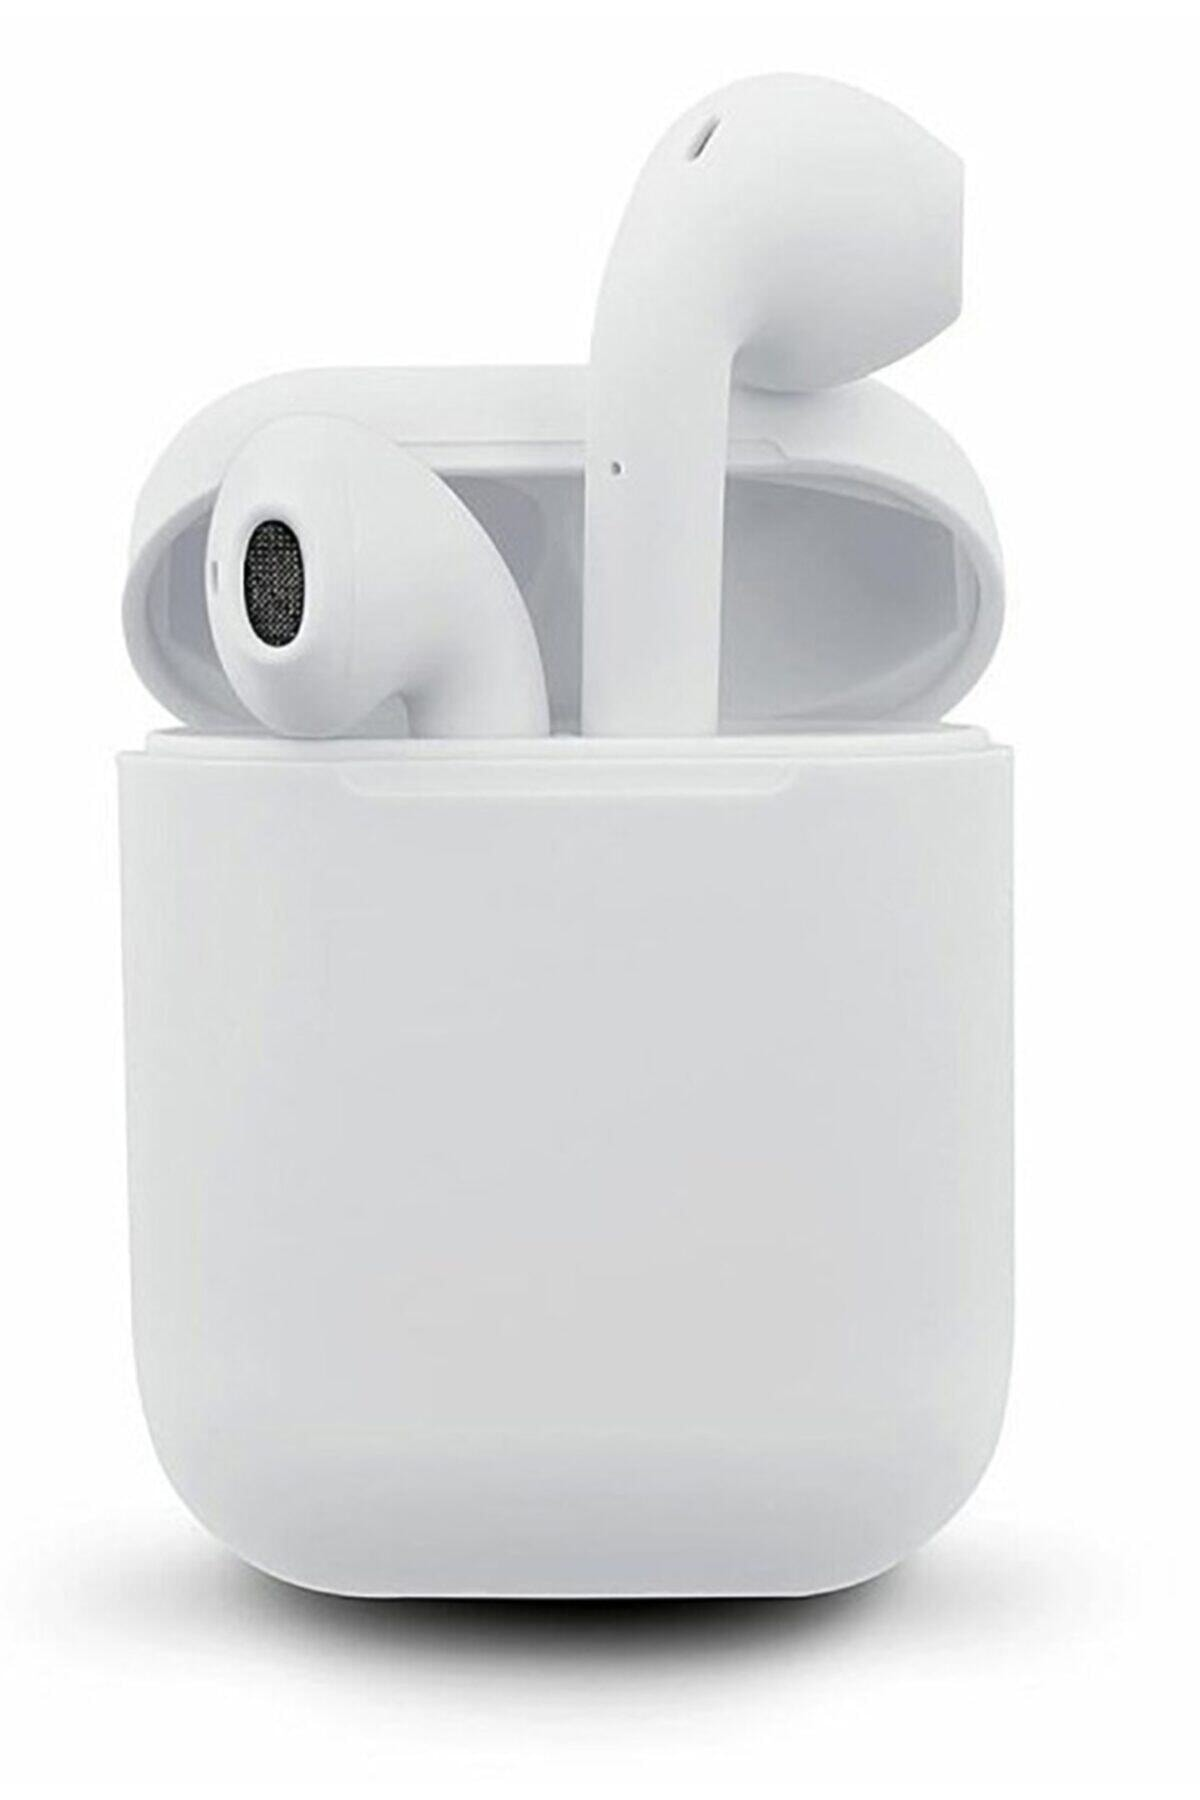 I12 Tws Beyaziphone Android Universal Uyumlu Airpods 5.0 Bluetooth Kulaklık